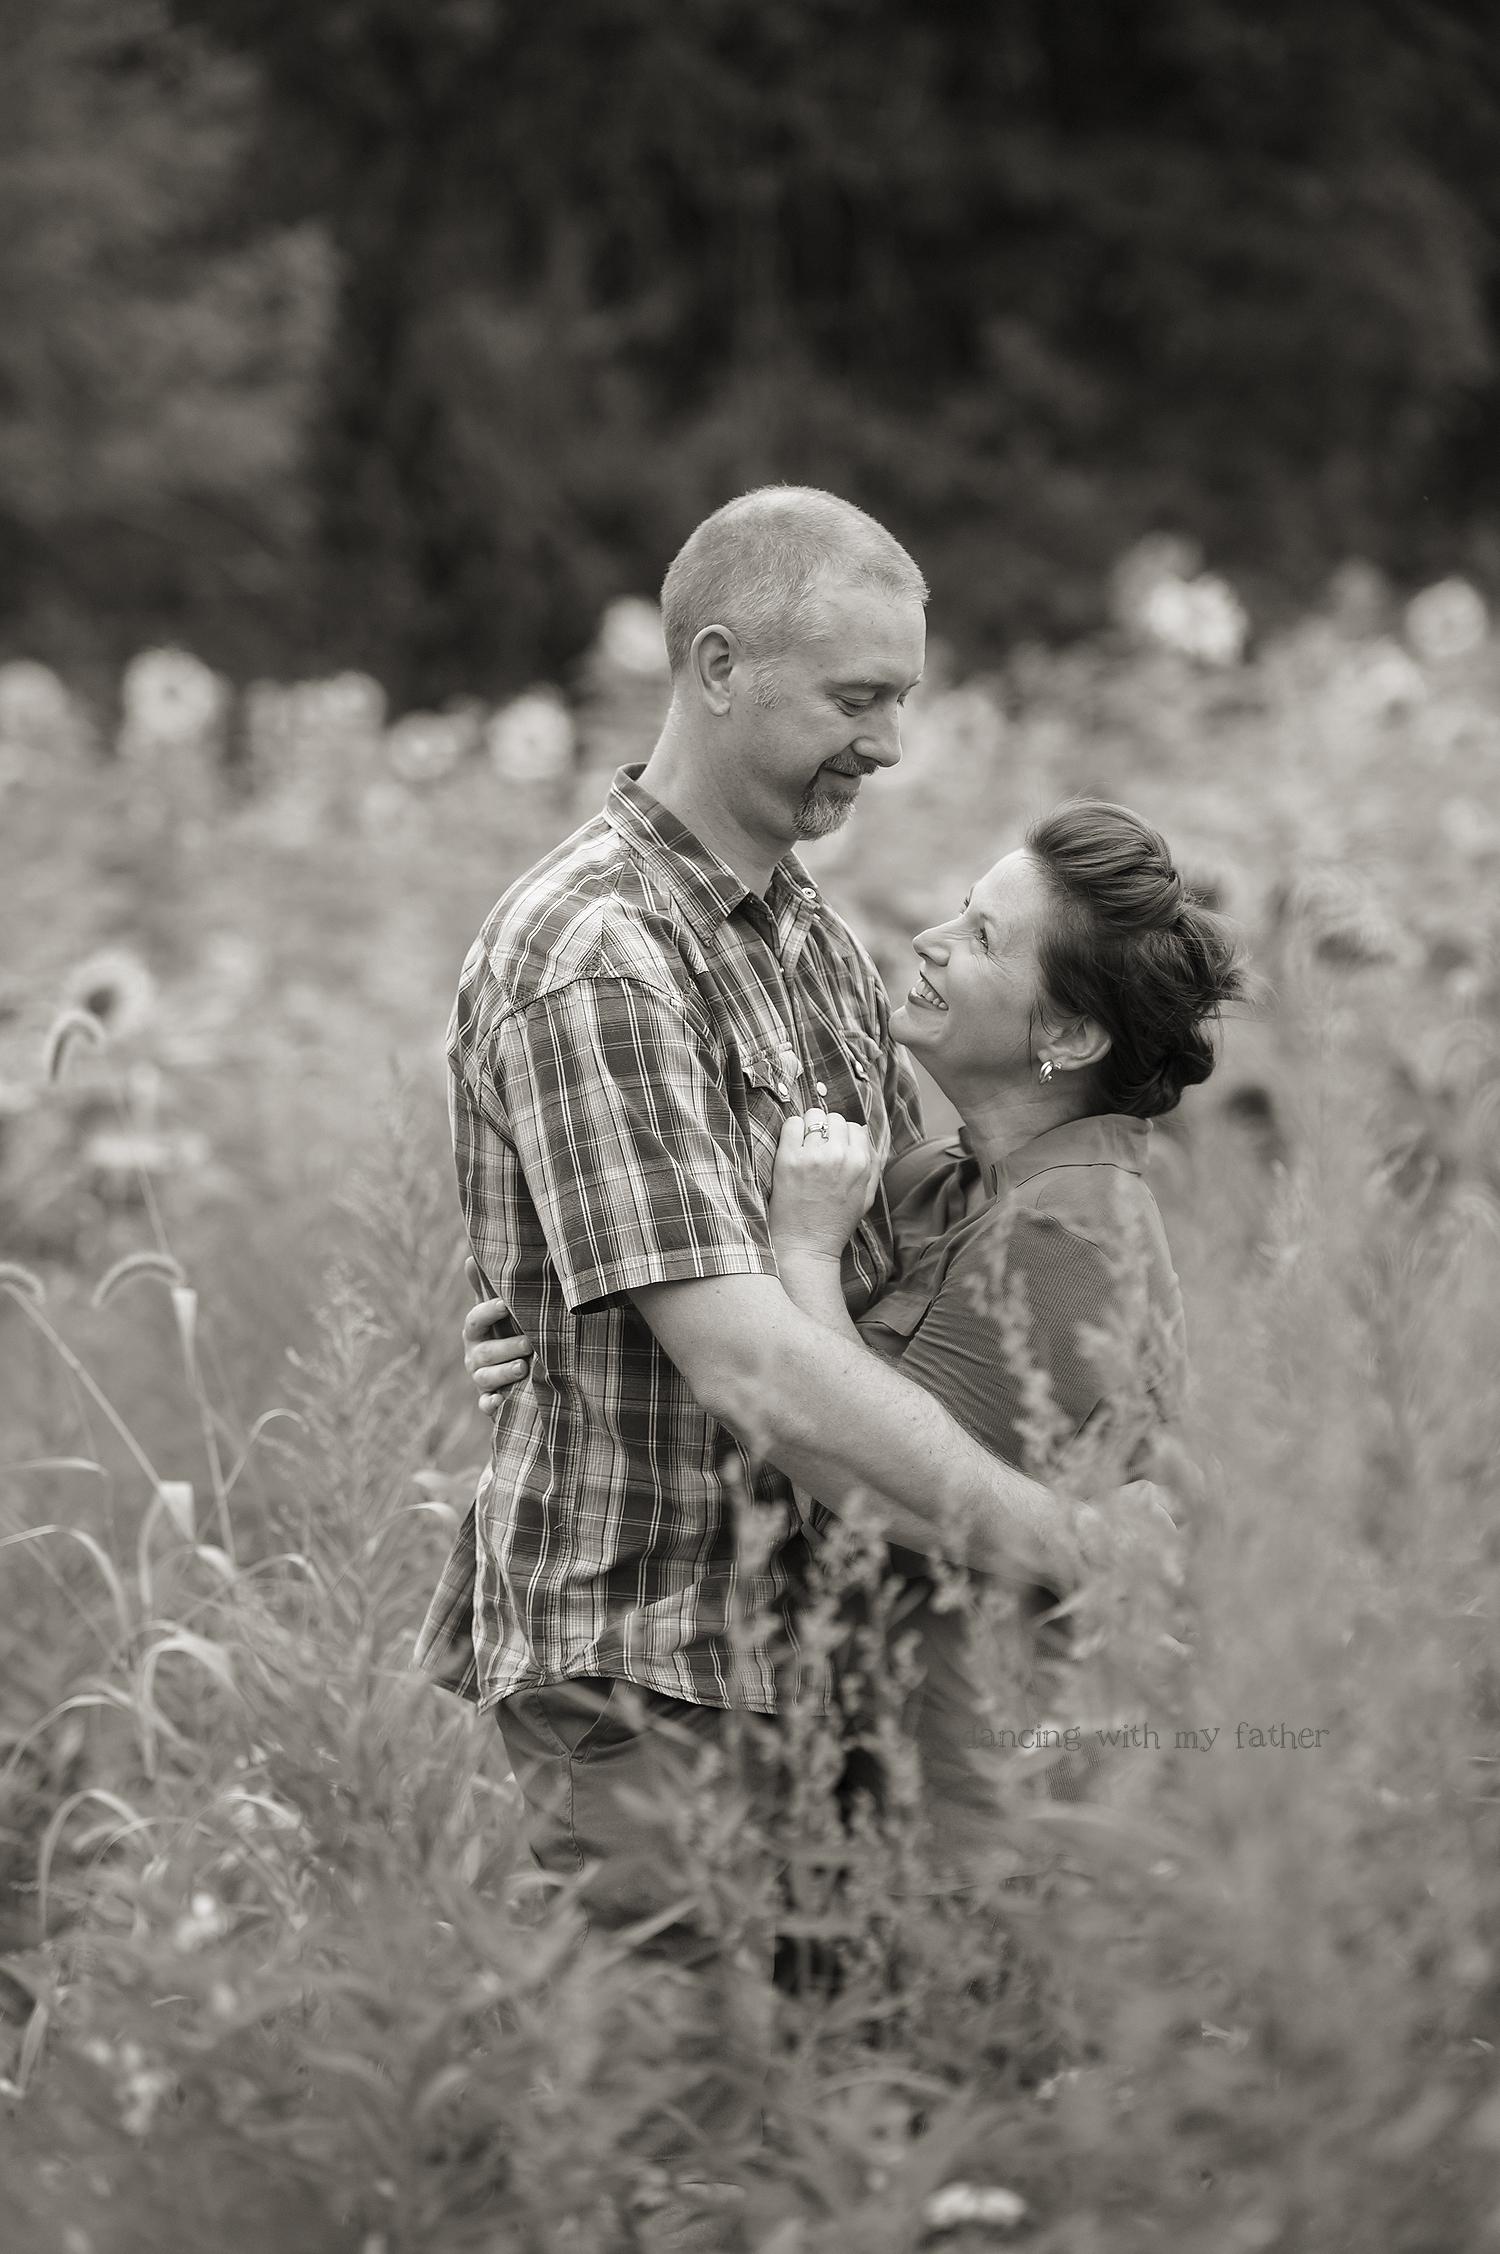 romance-through-seasons-in-marriage